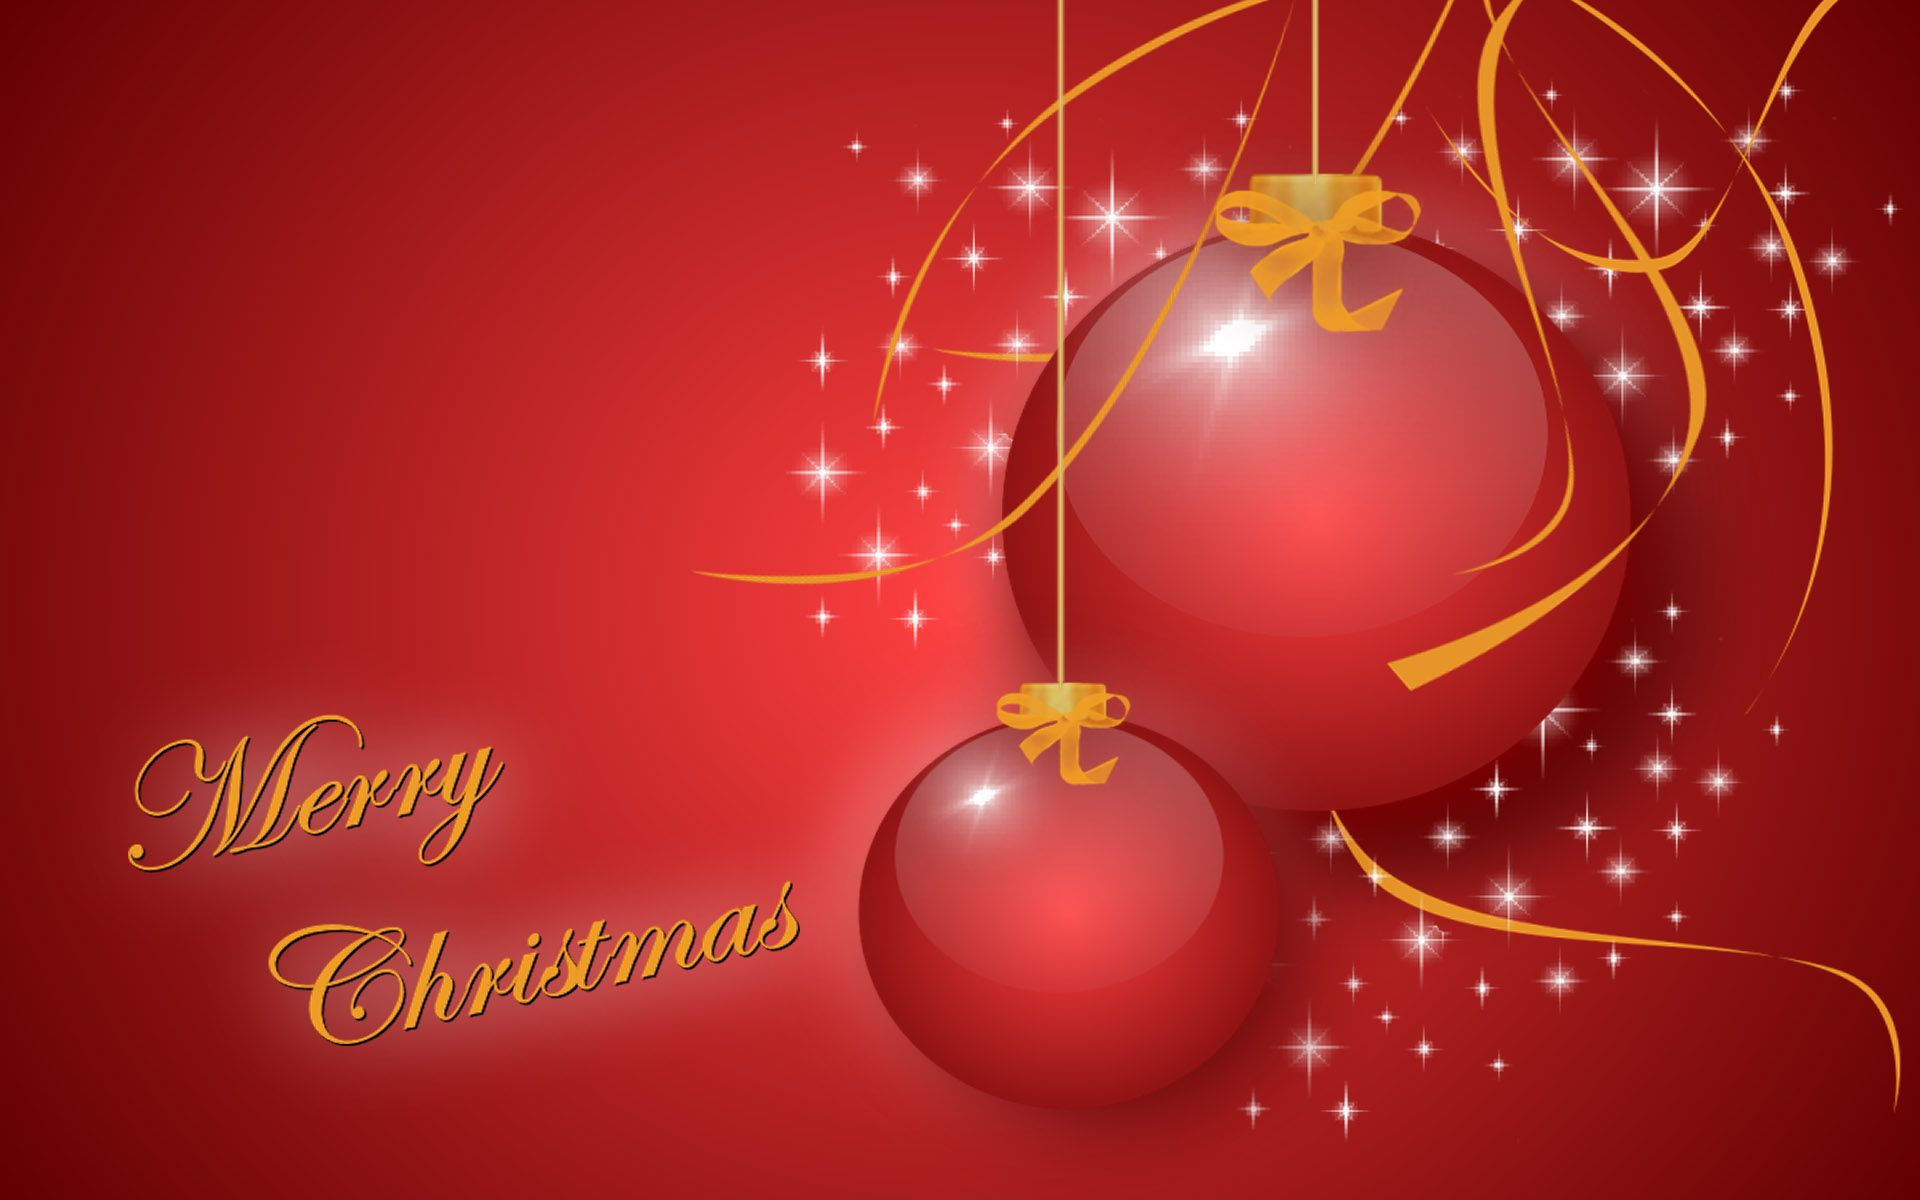 Pin by Elizabeth Reyes on iPhone wallpaper Christmas